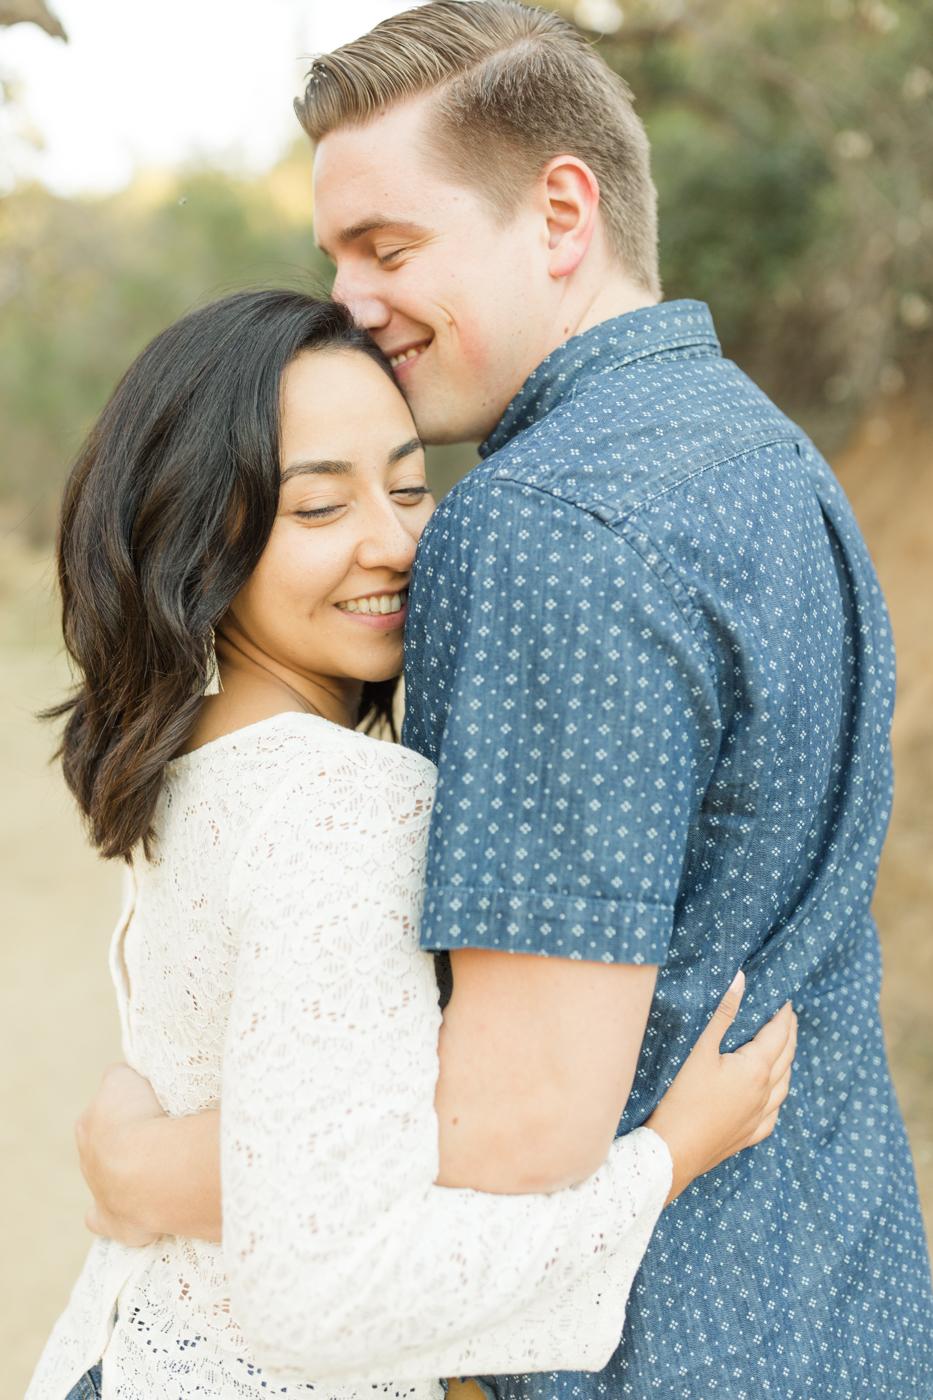 DTLA Engagement Session - Christa Norman Photography - Destination Wedding Photographer-34.jpg